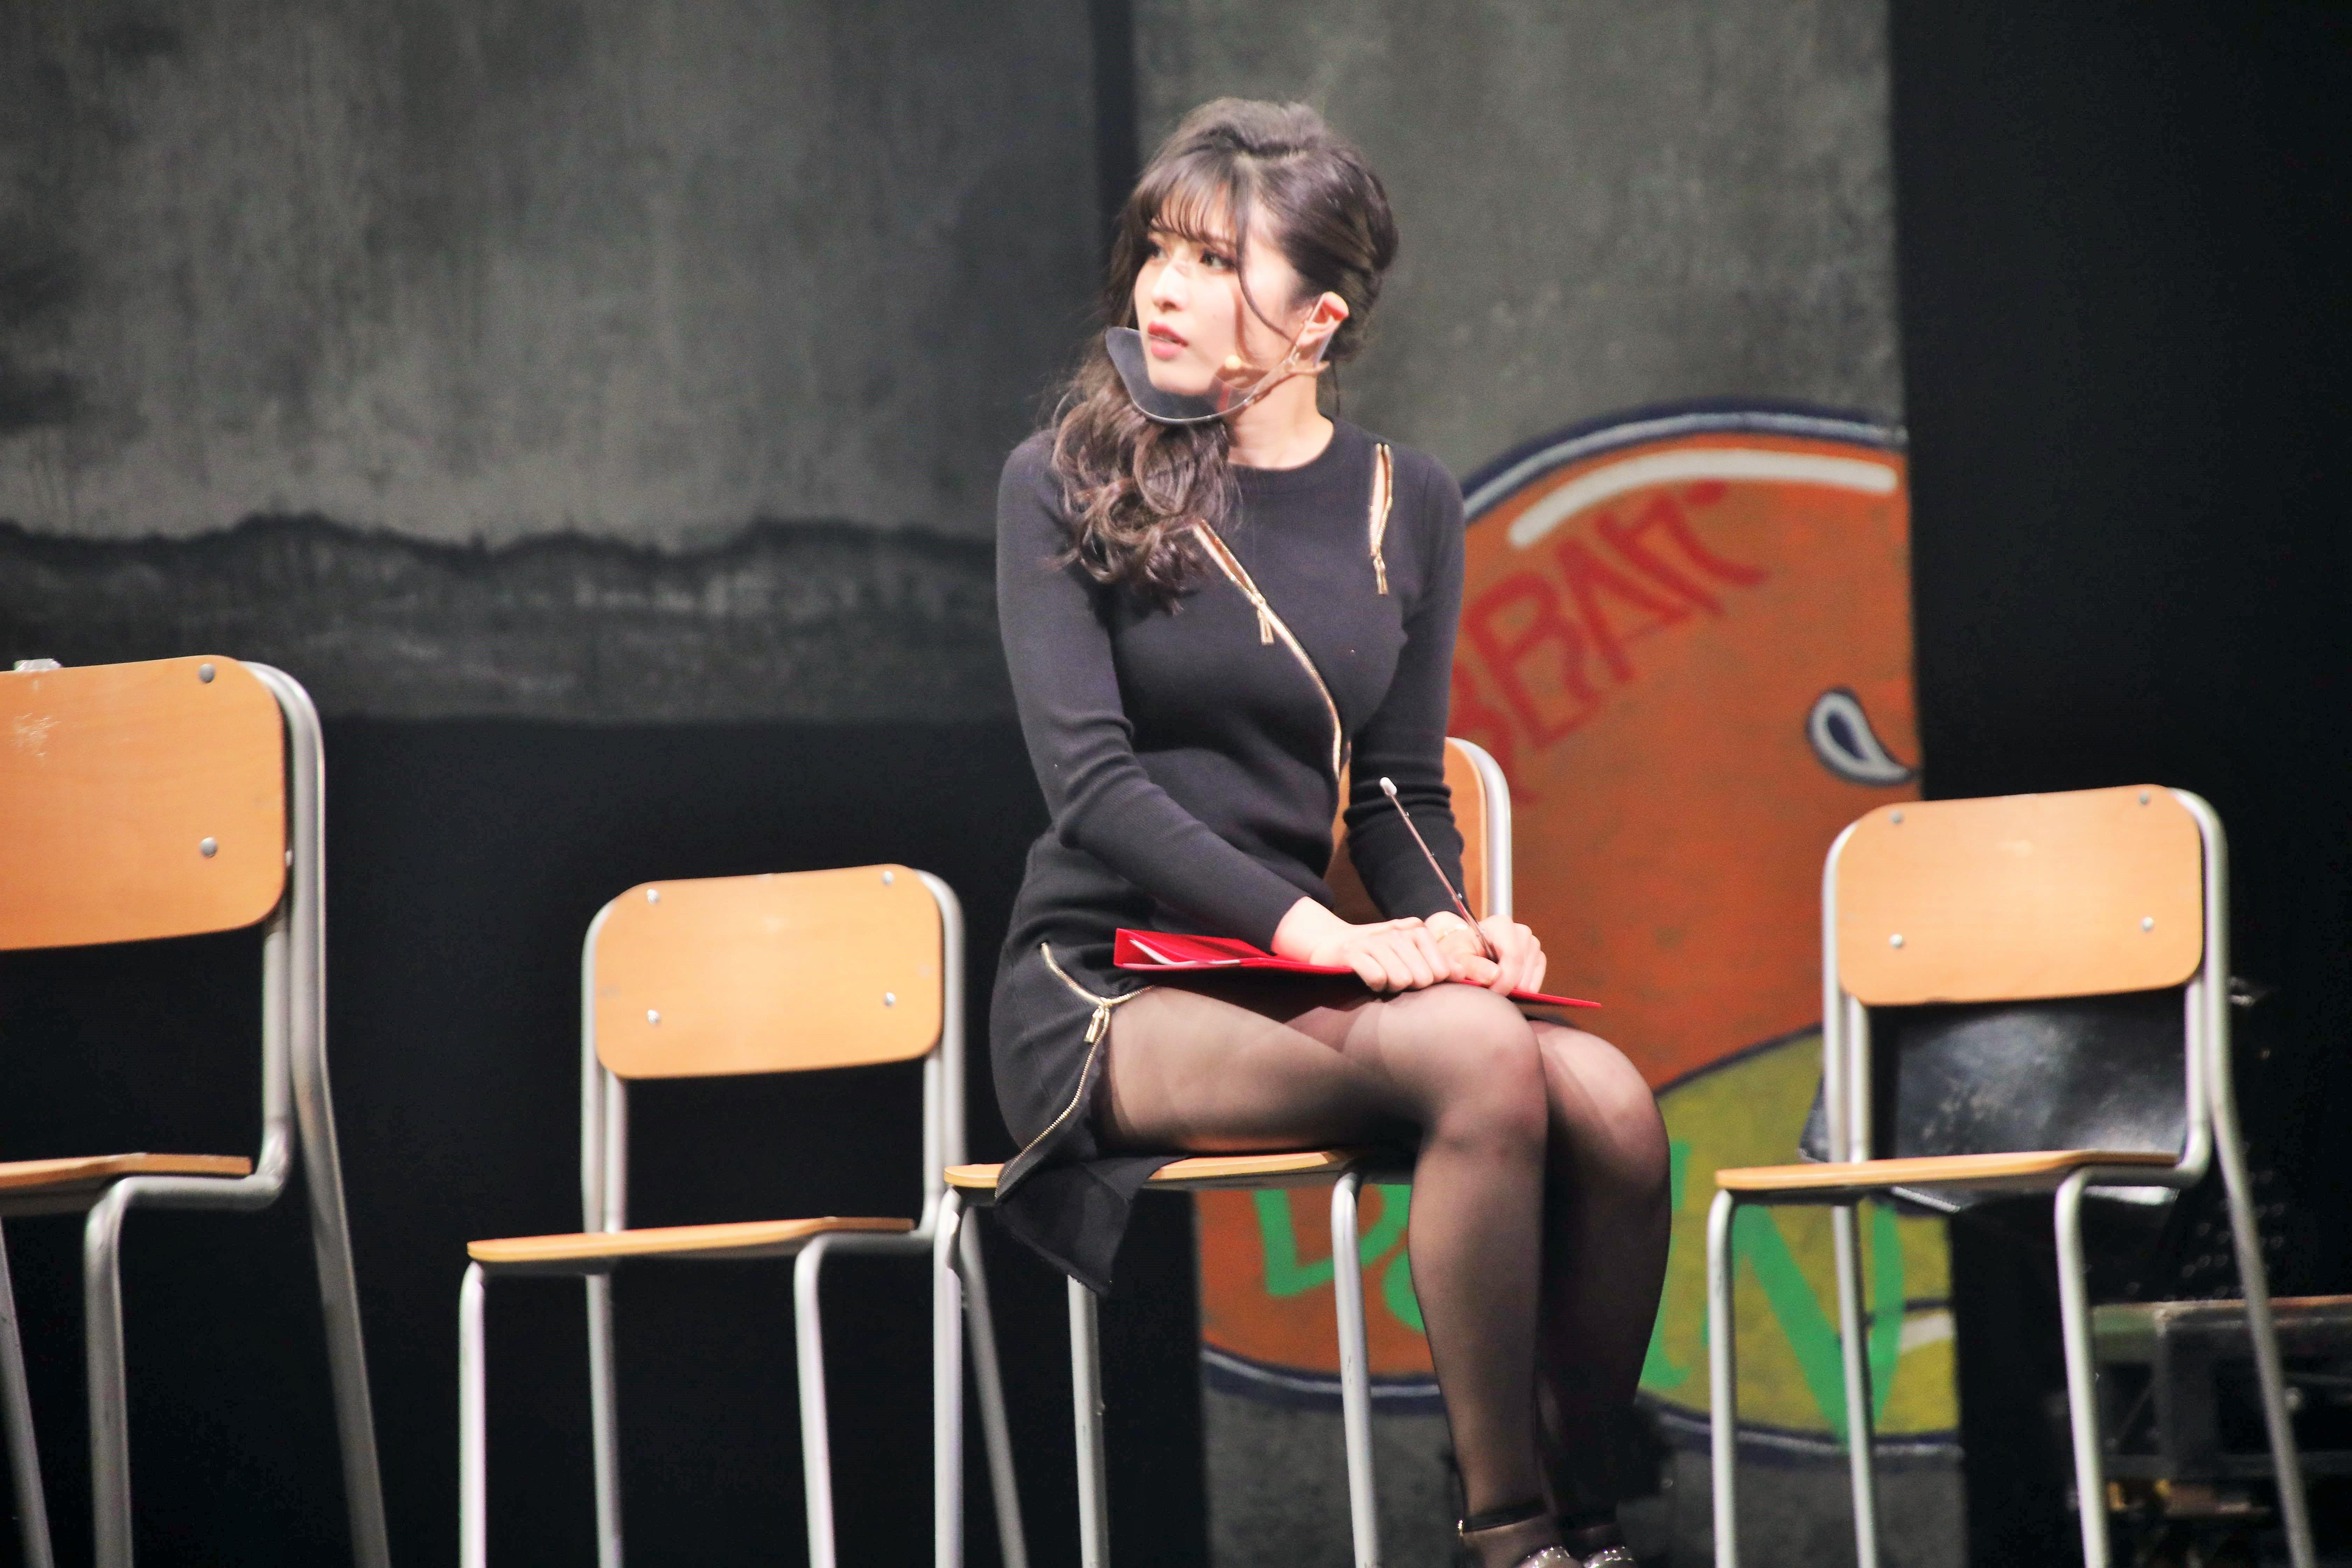 (C) 舞台「マジムリ学園 蕾-RAI-」製作委員会:無断転送・アップロード禁止